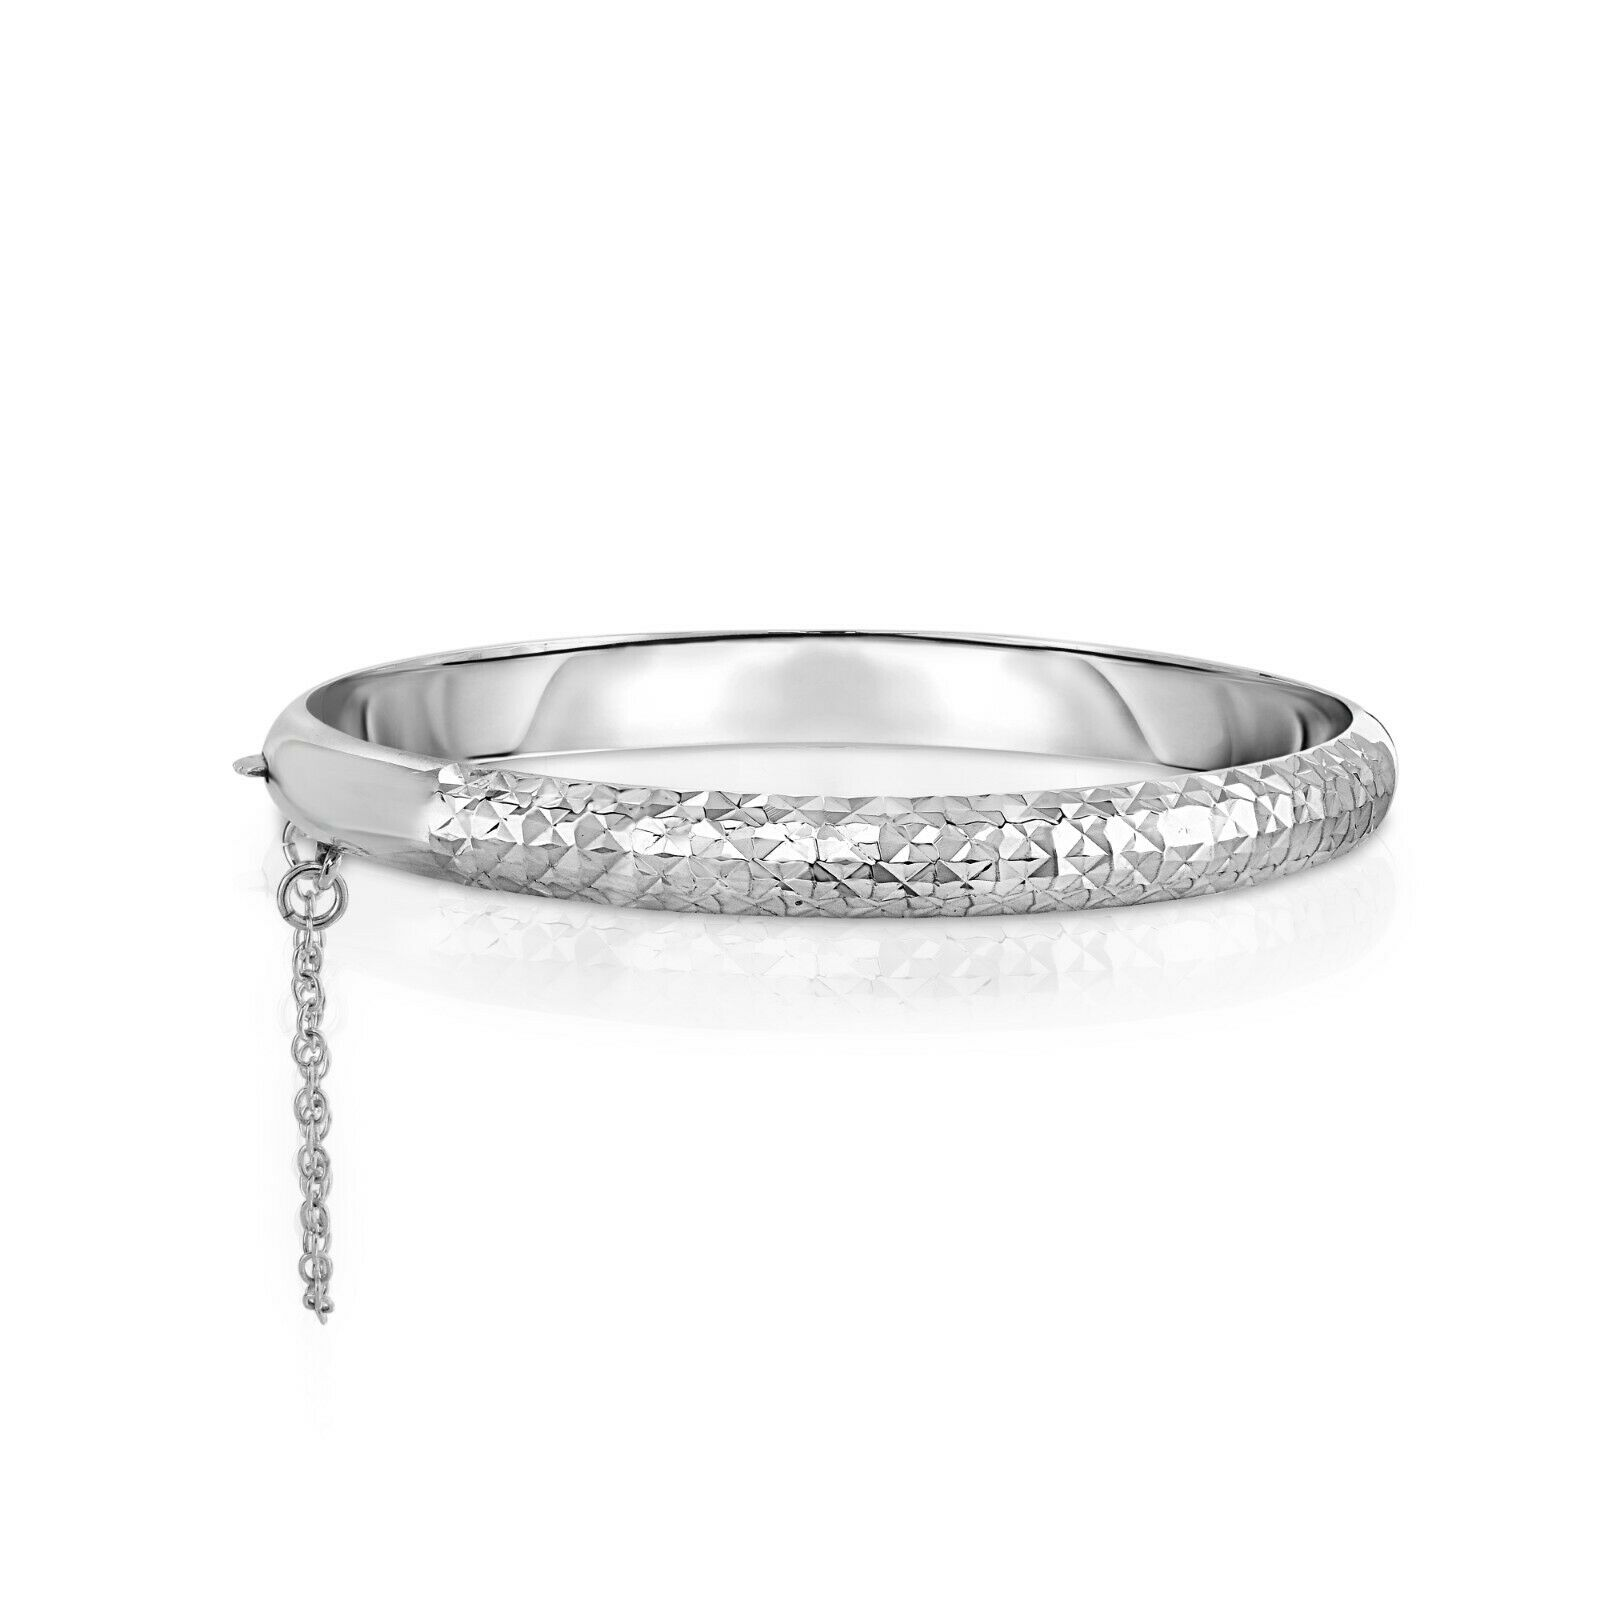 "Sterling Silver 925 7MM Diamond- Cut Bangle Bracelet For Women-7"" Inch- 3 Colors"